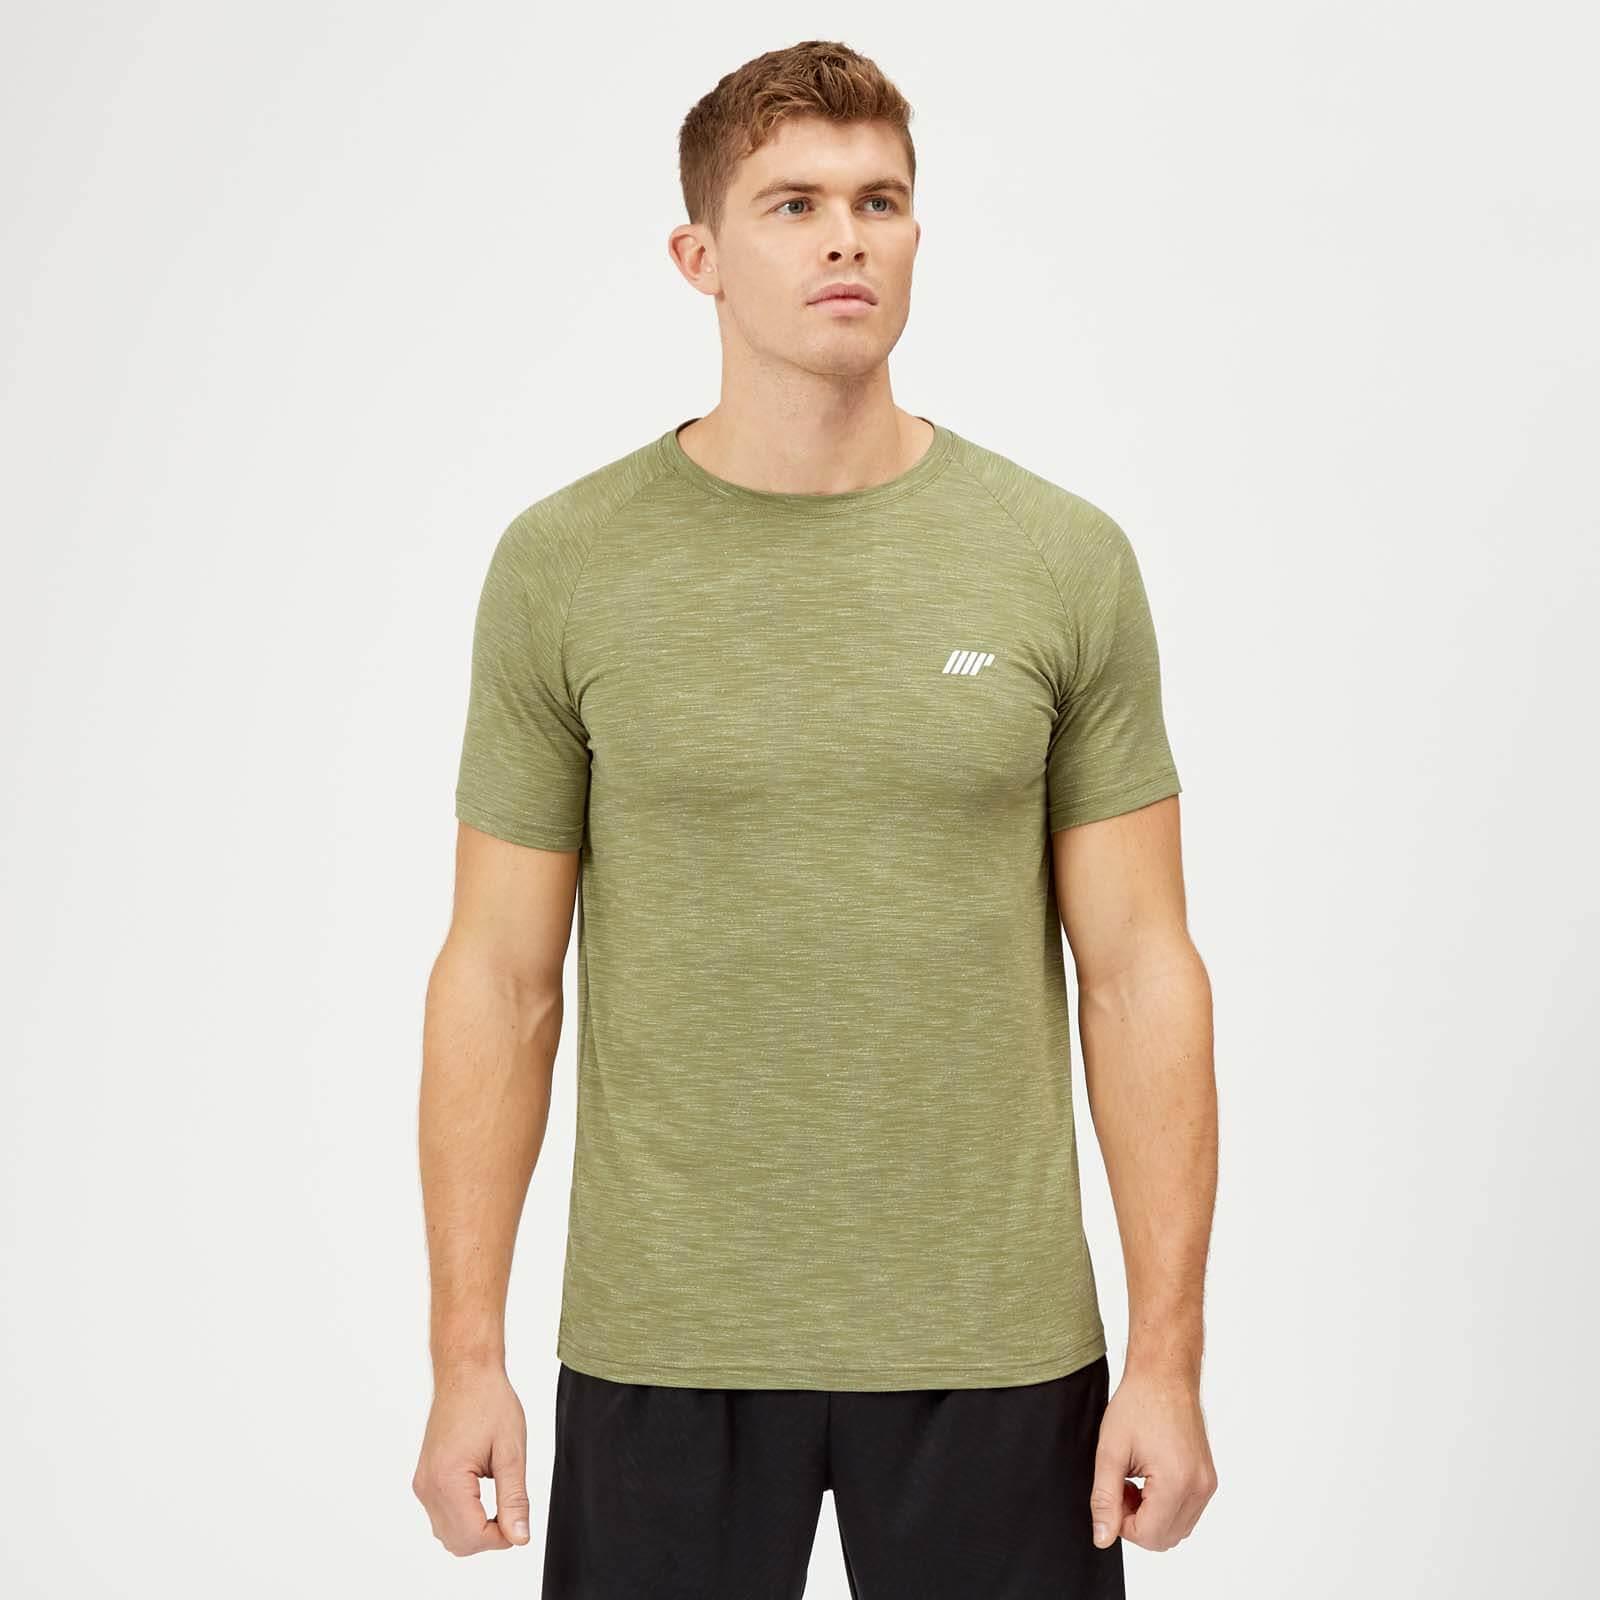 ... Performance tričko - limitovaná edice - XS - Light Olive 34b2368669